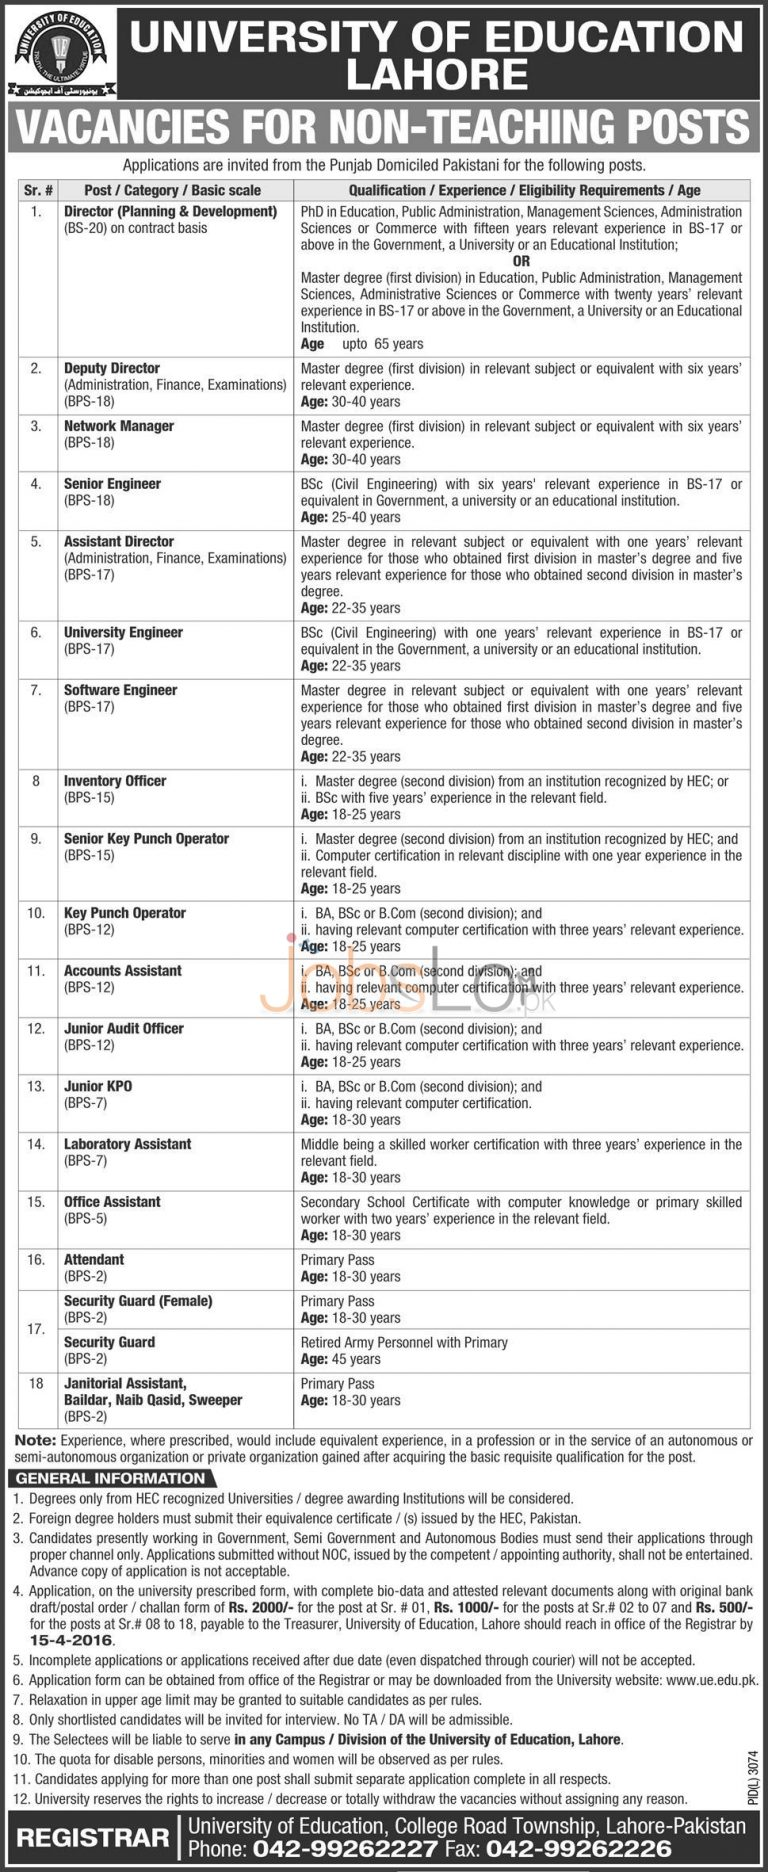 University of Education Lahore Jobs 2016 For Non- Teaching Staff Eligibility Criteria